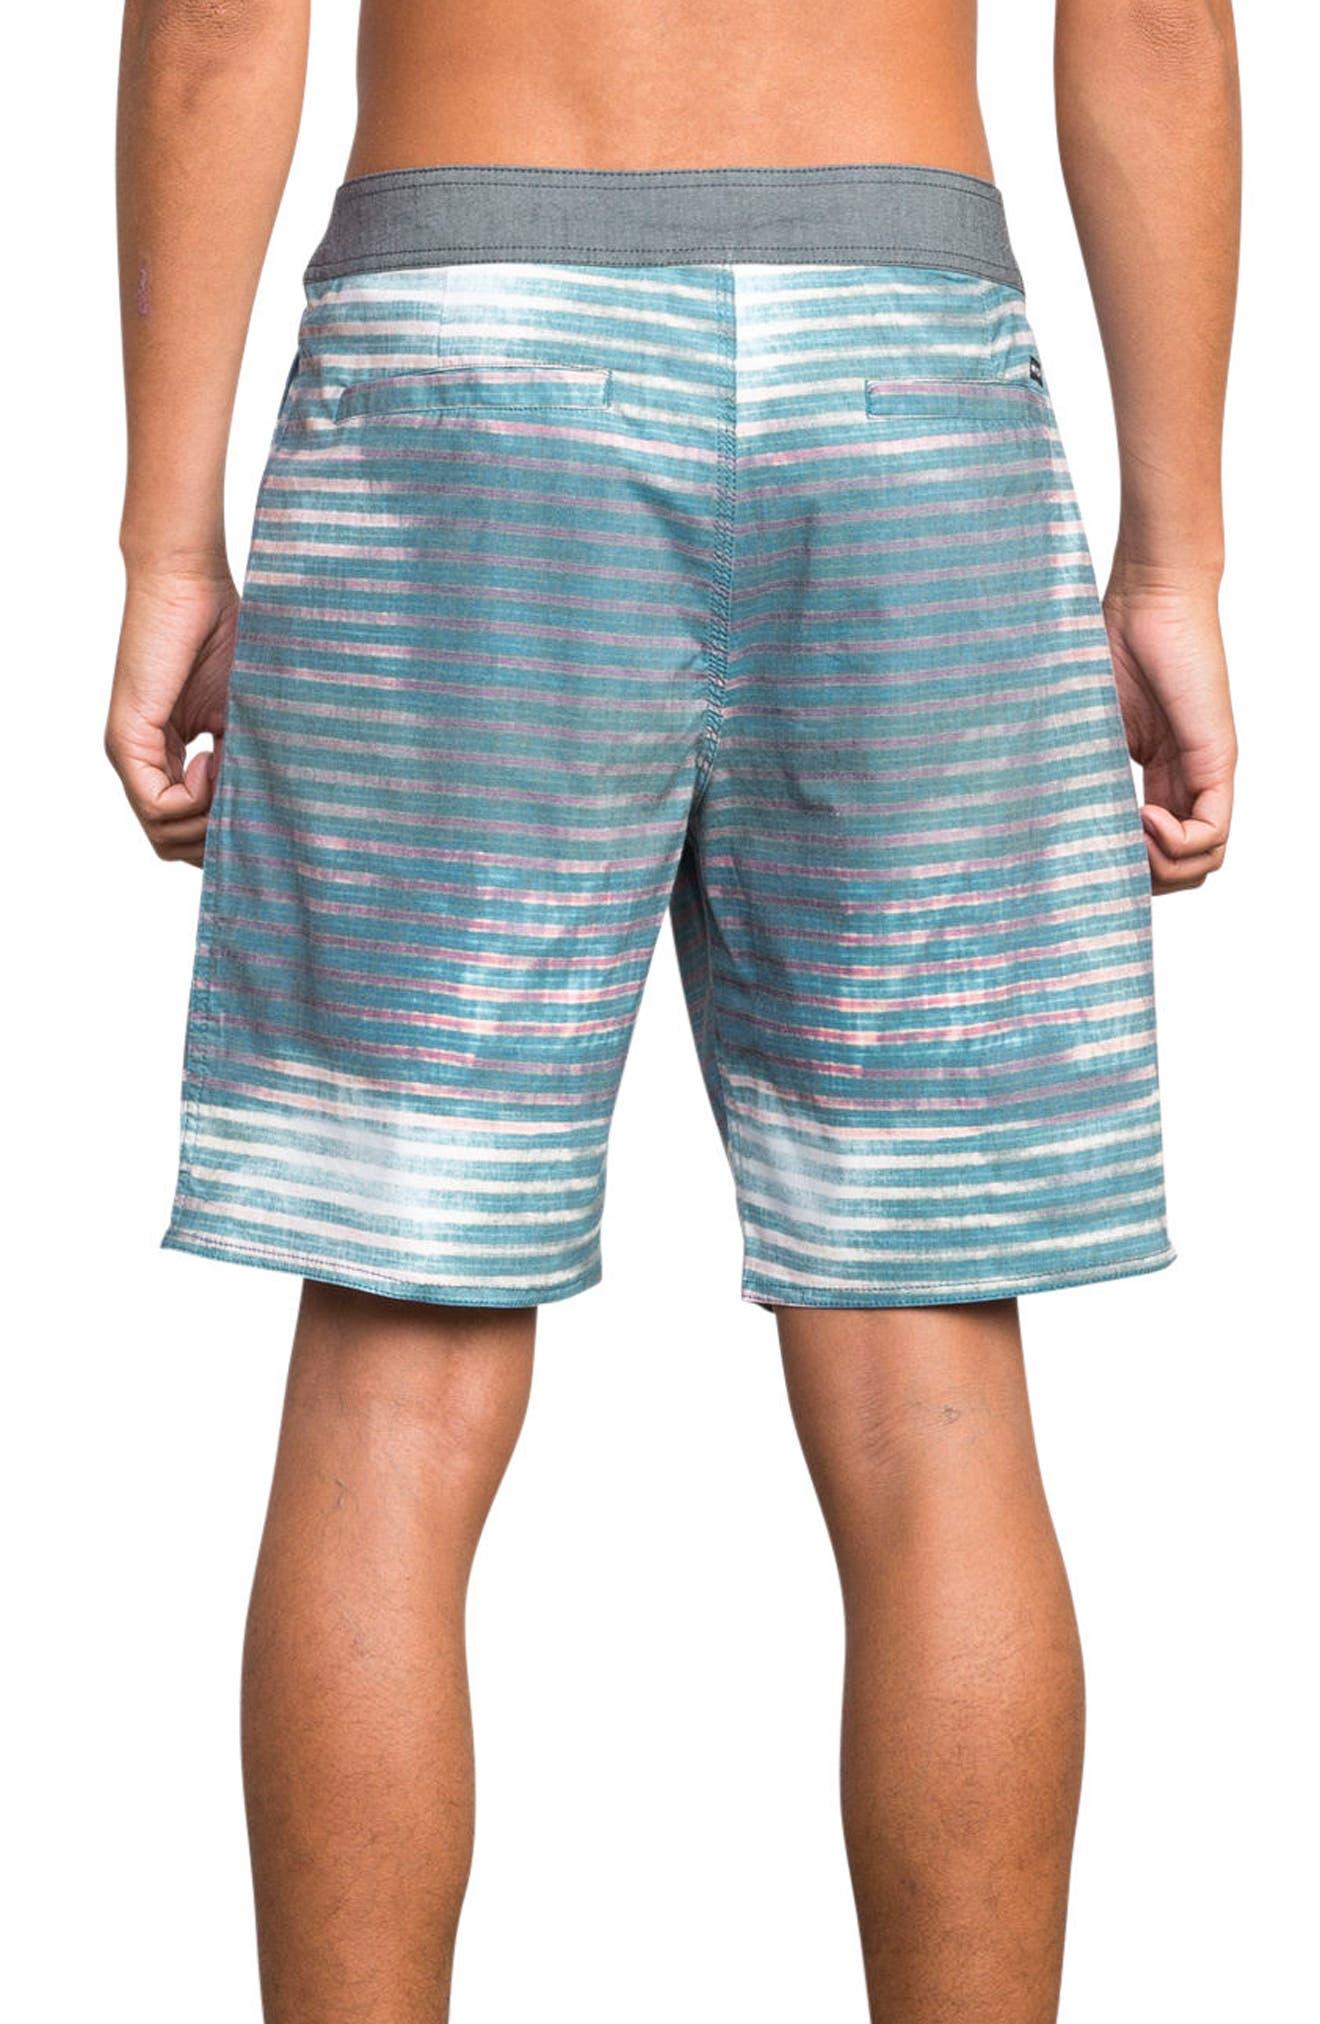 Boppa Stripe Swim Trunks,                             Alternate thumbnail 2, color,                             Blue Fade